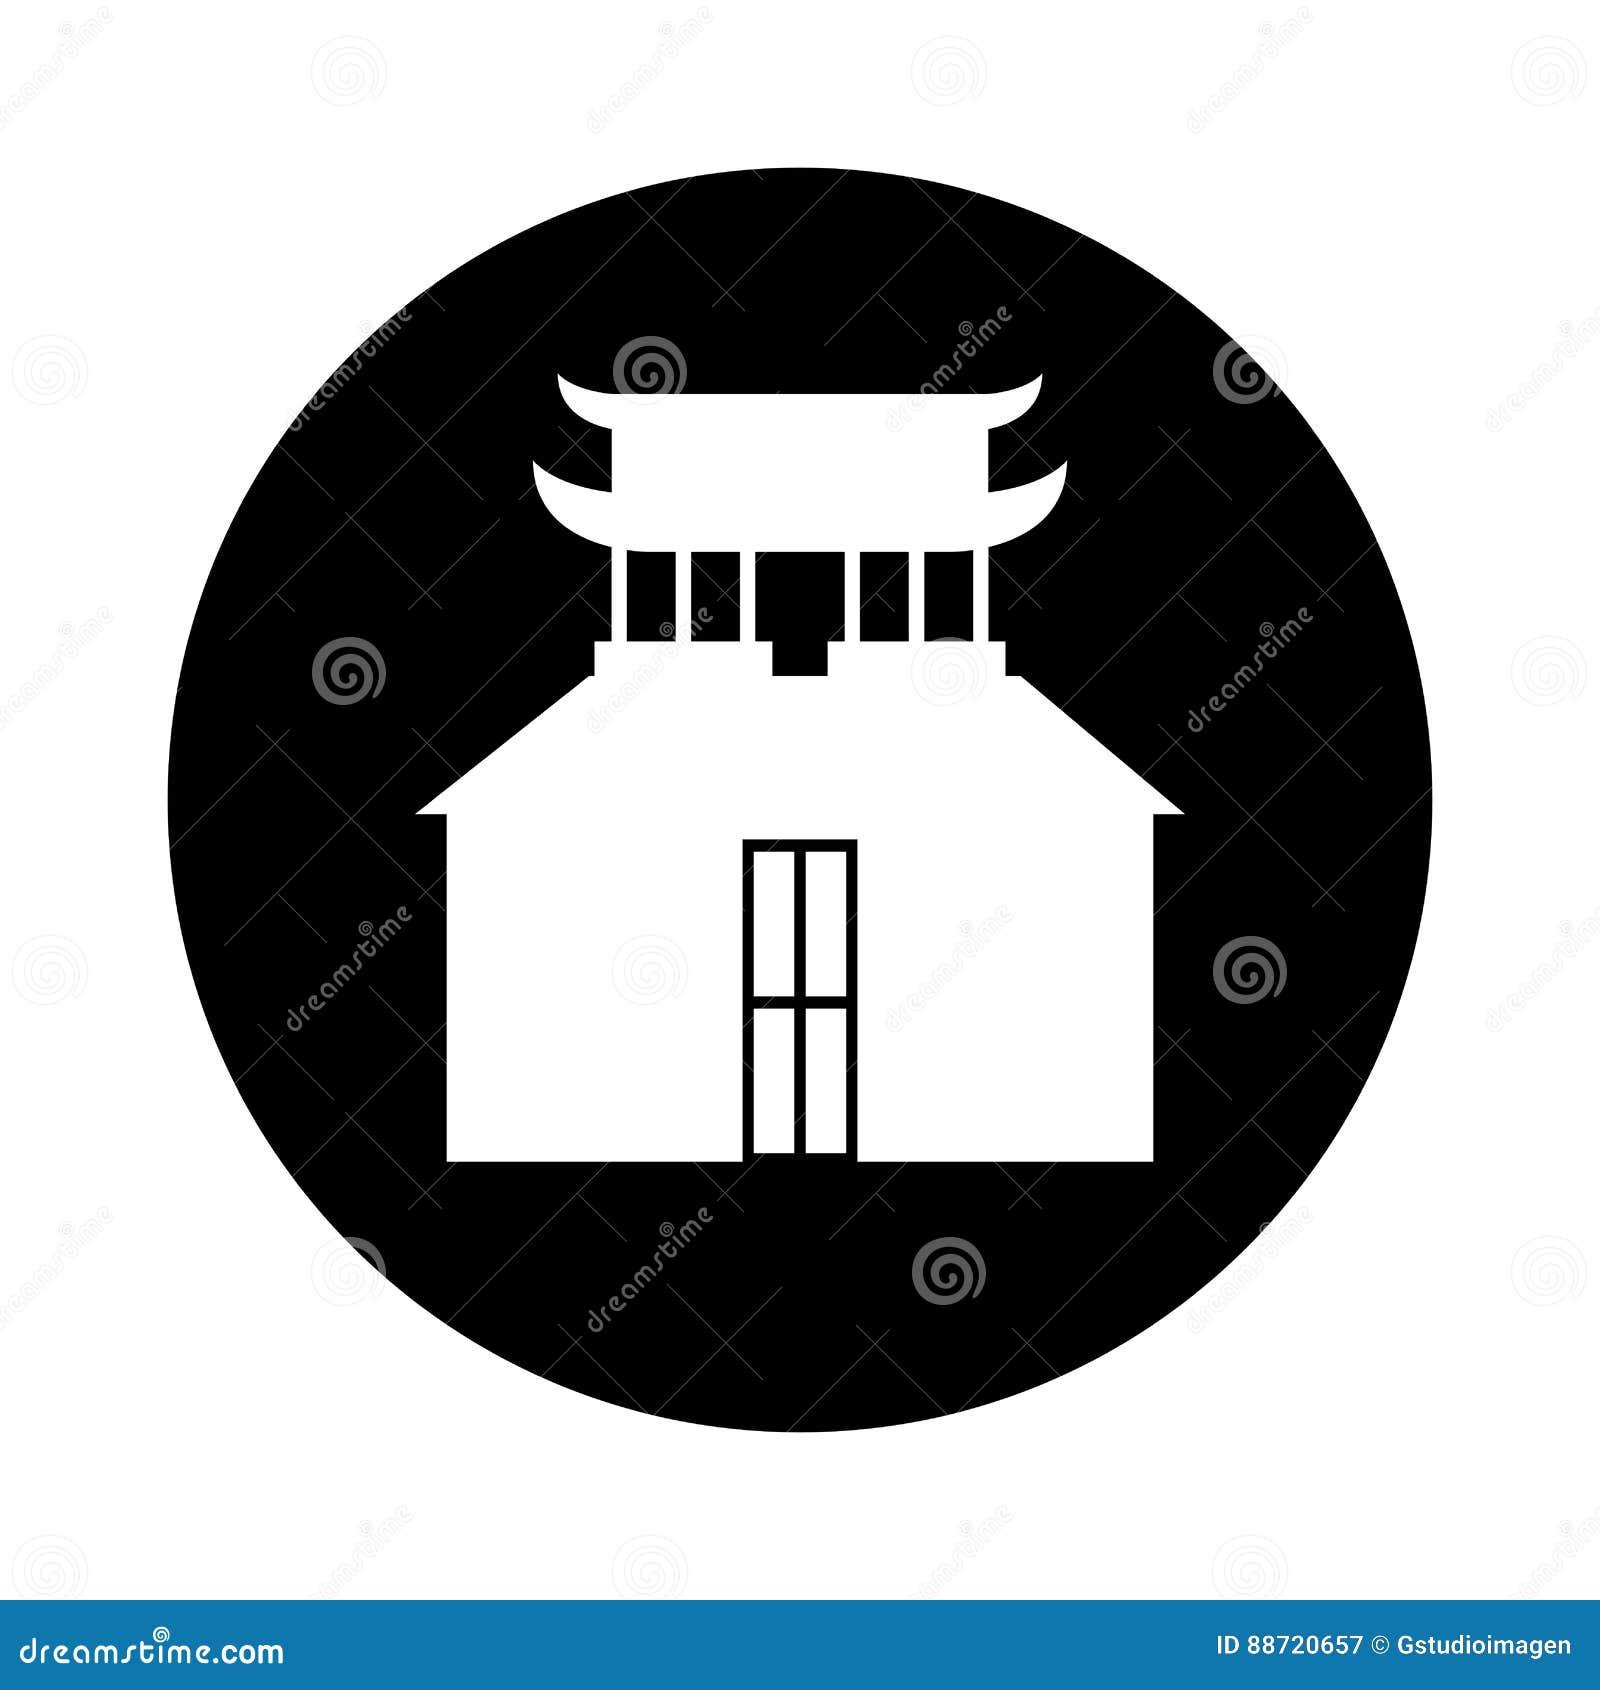 asian building castle icon stock vector - image: 88720657